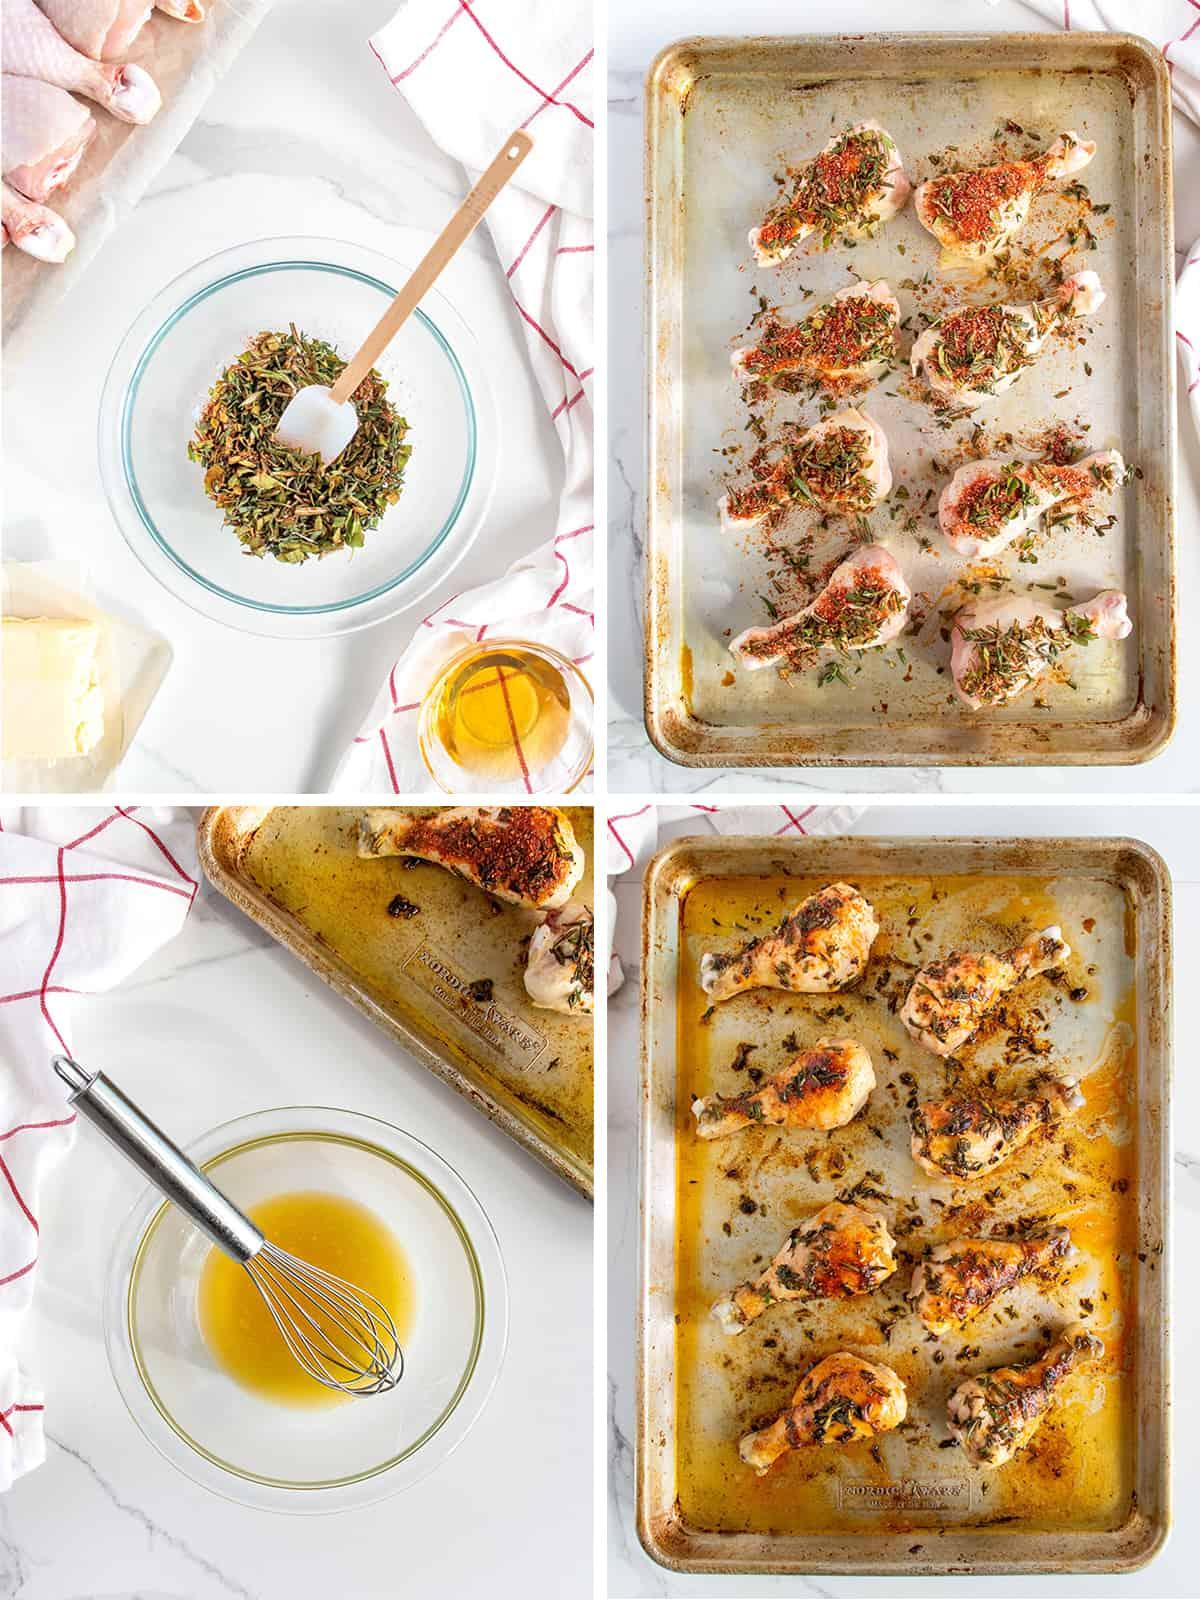 Honey Herb Roasted Chicken Drumsticks by The BakerMama